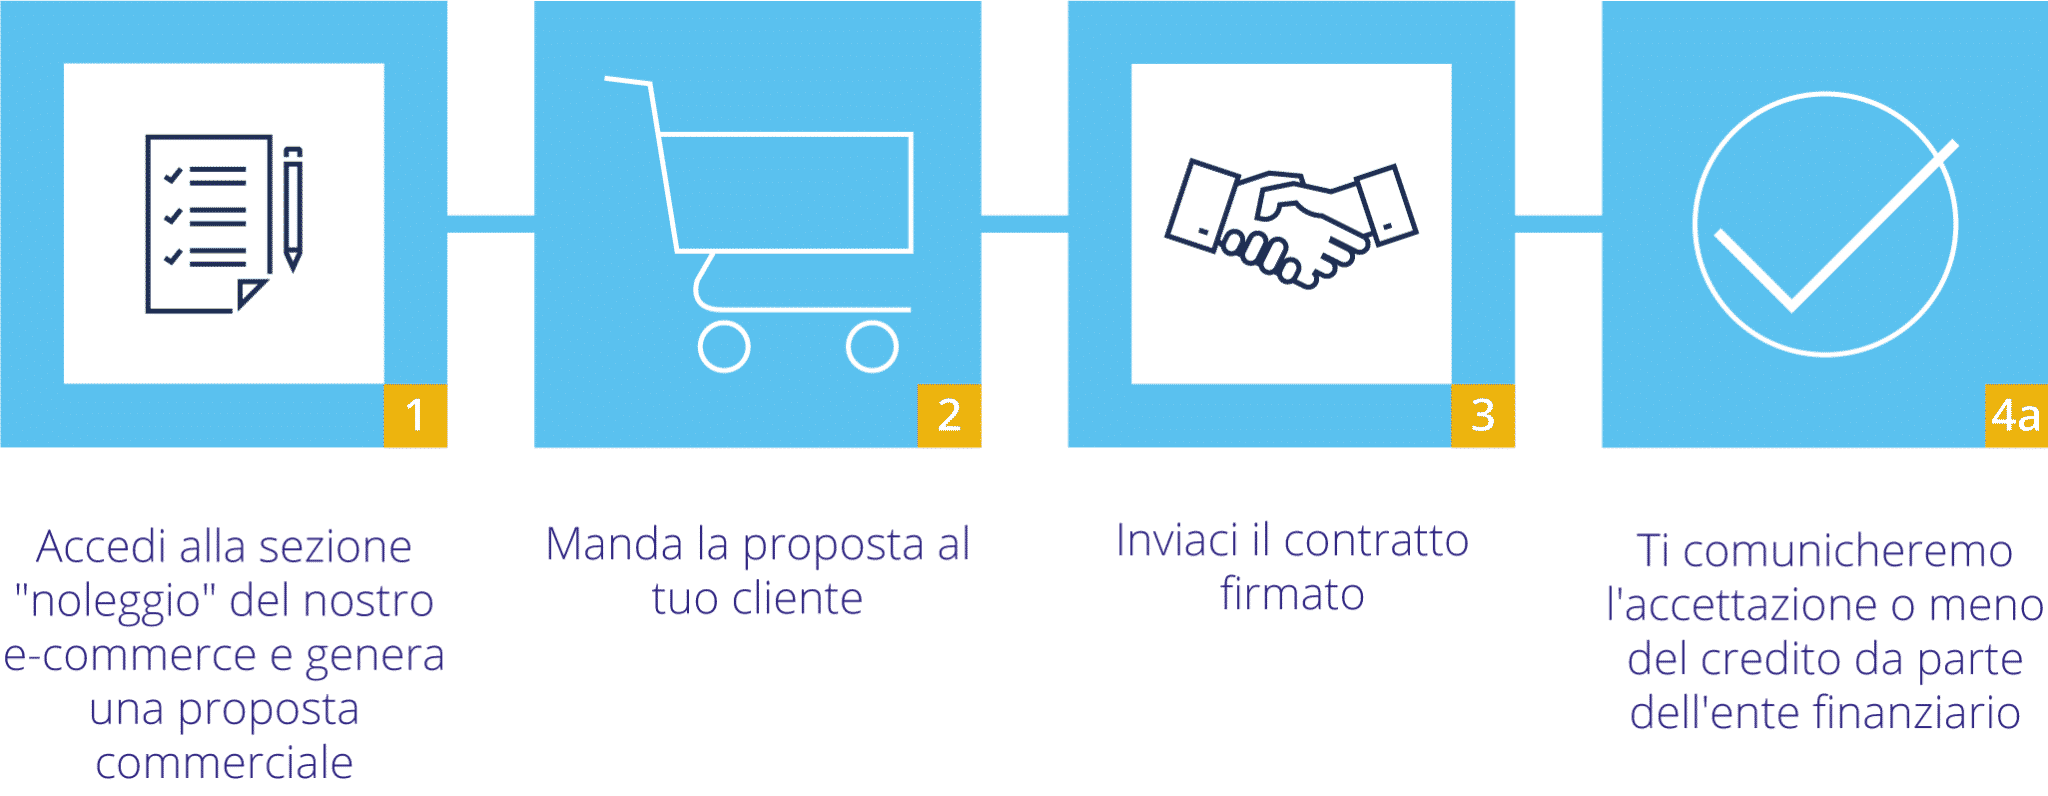 Smart-Rent-Infograficha-Utente-5